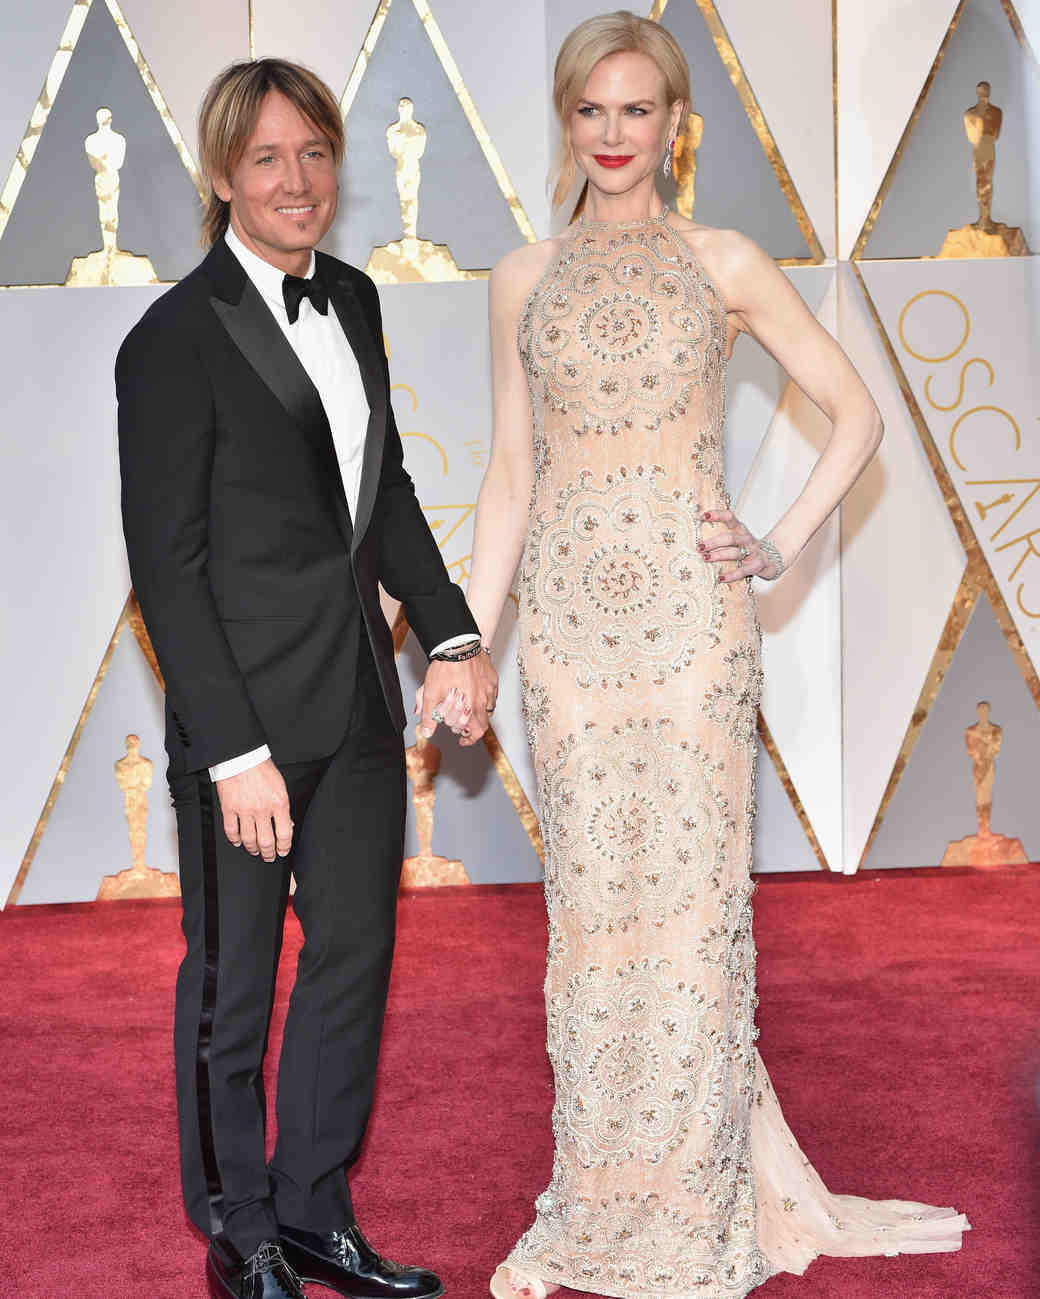 Keith Urban and Nicole Kidman at 2017 Academy Awards